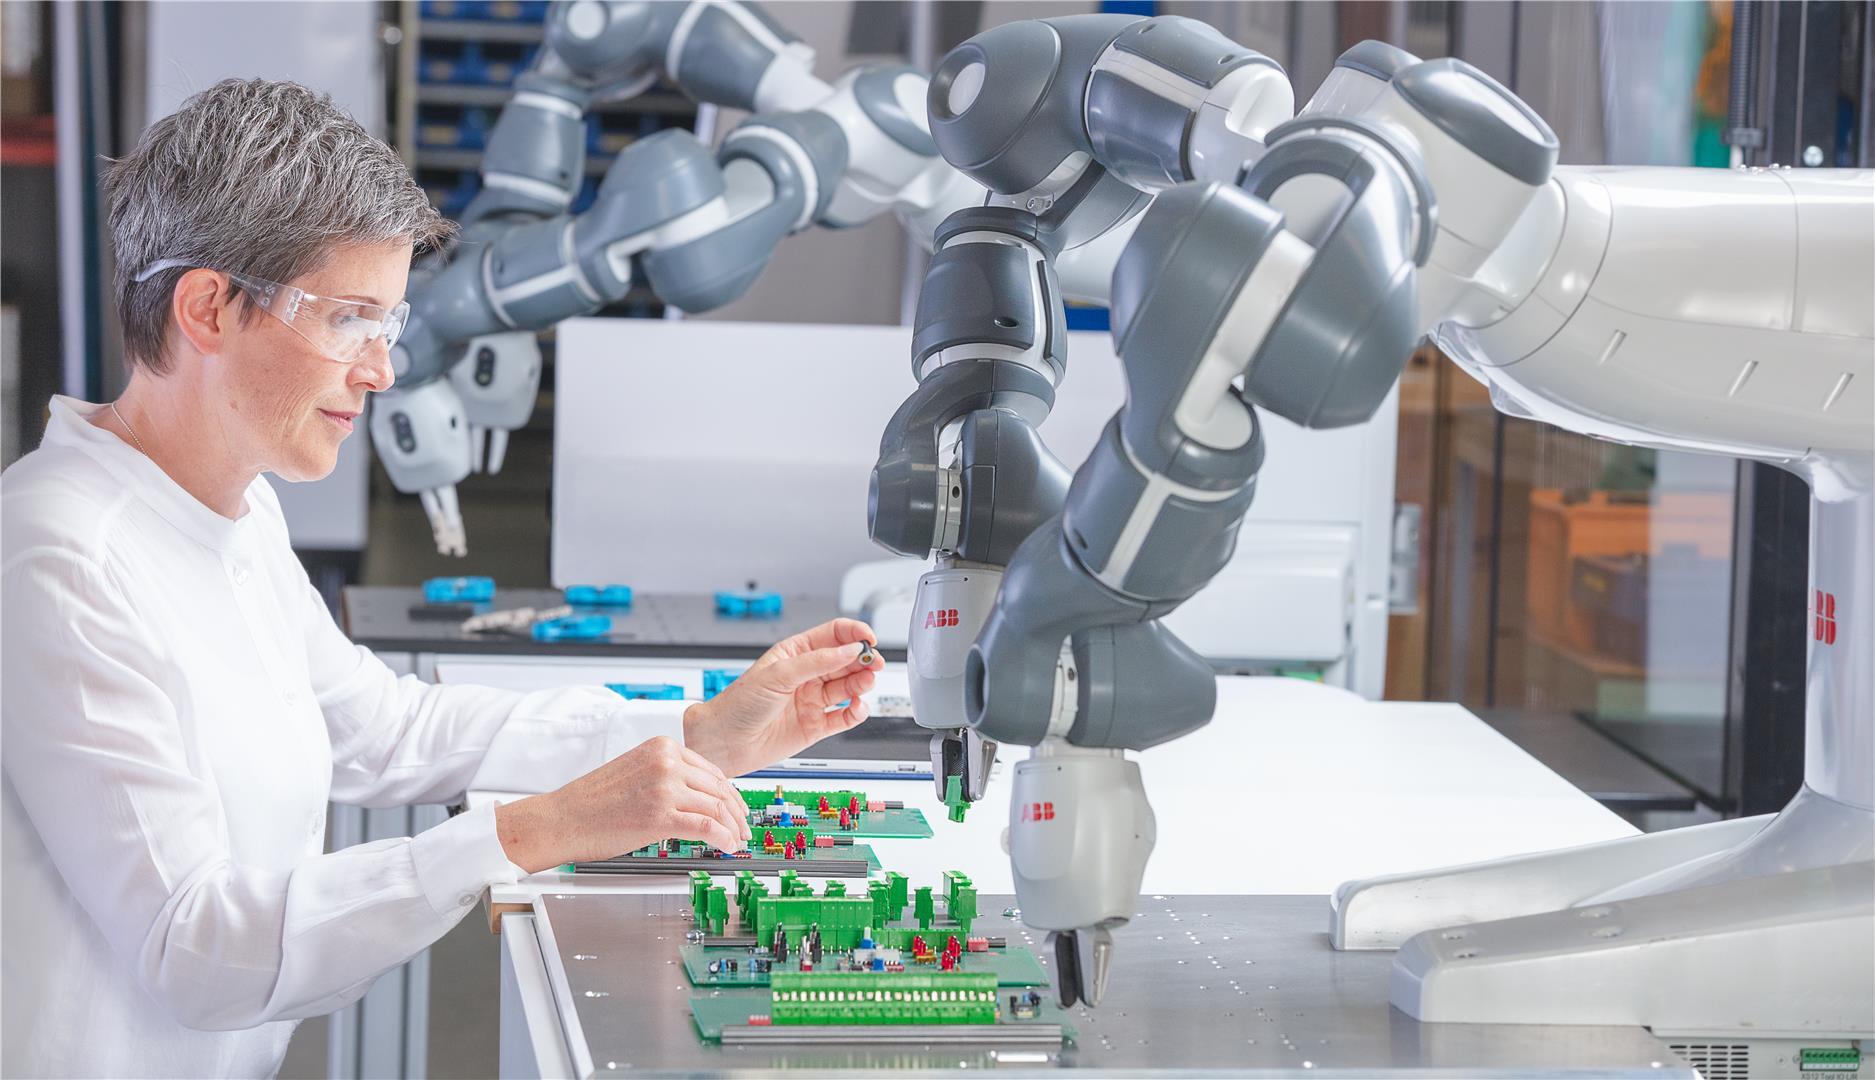 ABB機器人yumi 3C組裝 X Robotics愛科思機器人x-ltd.com